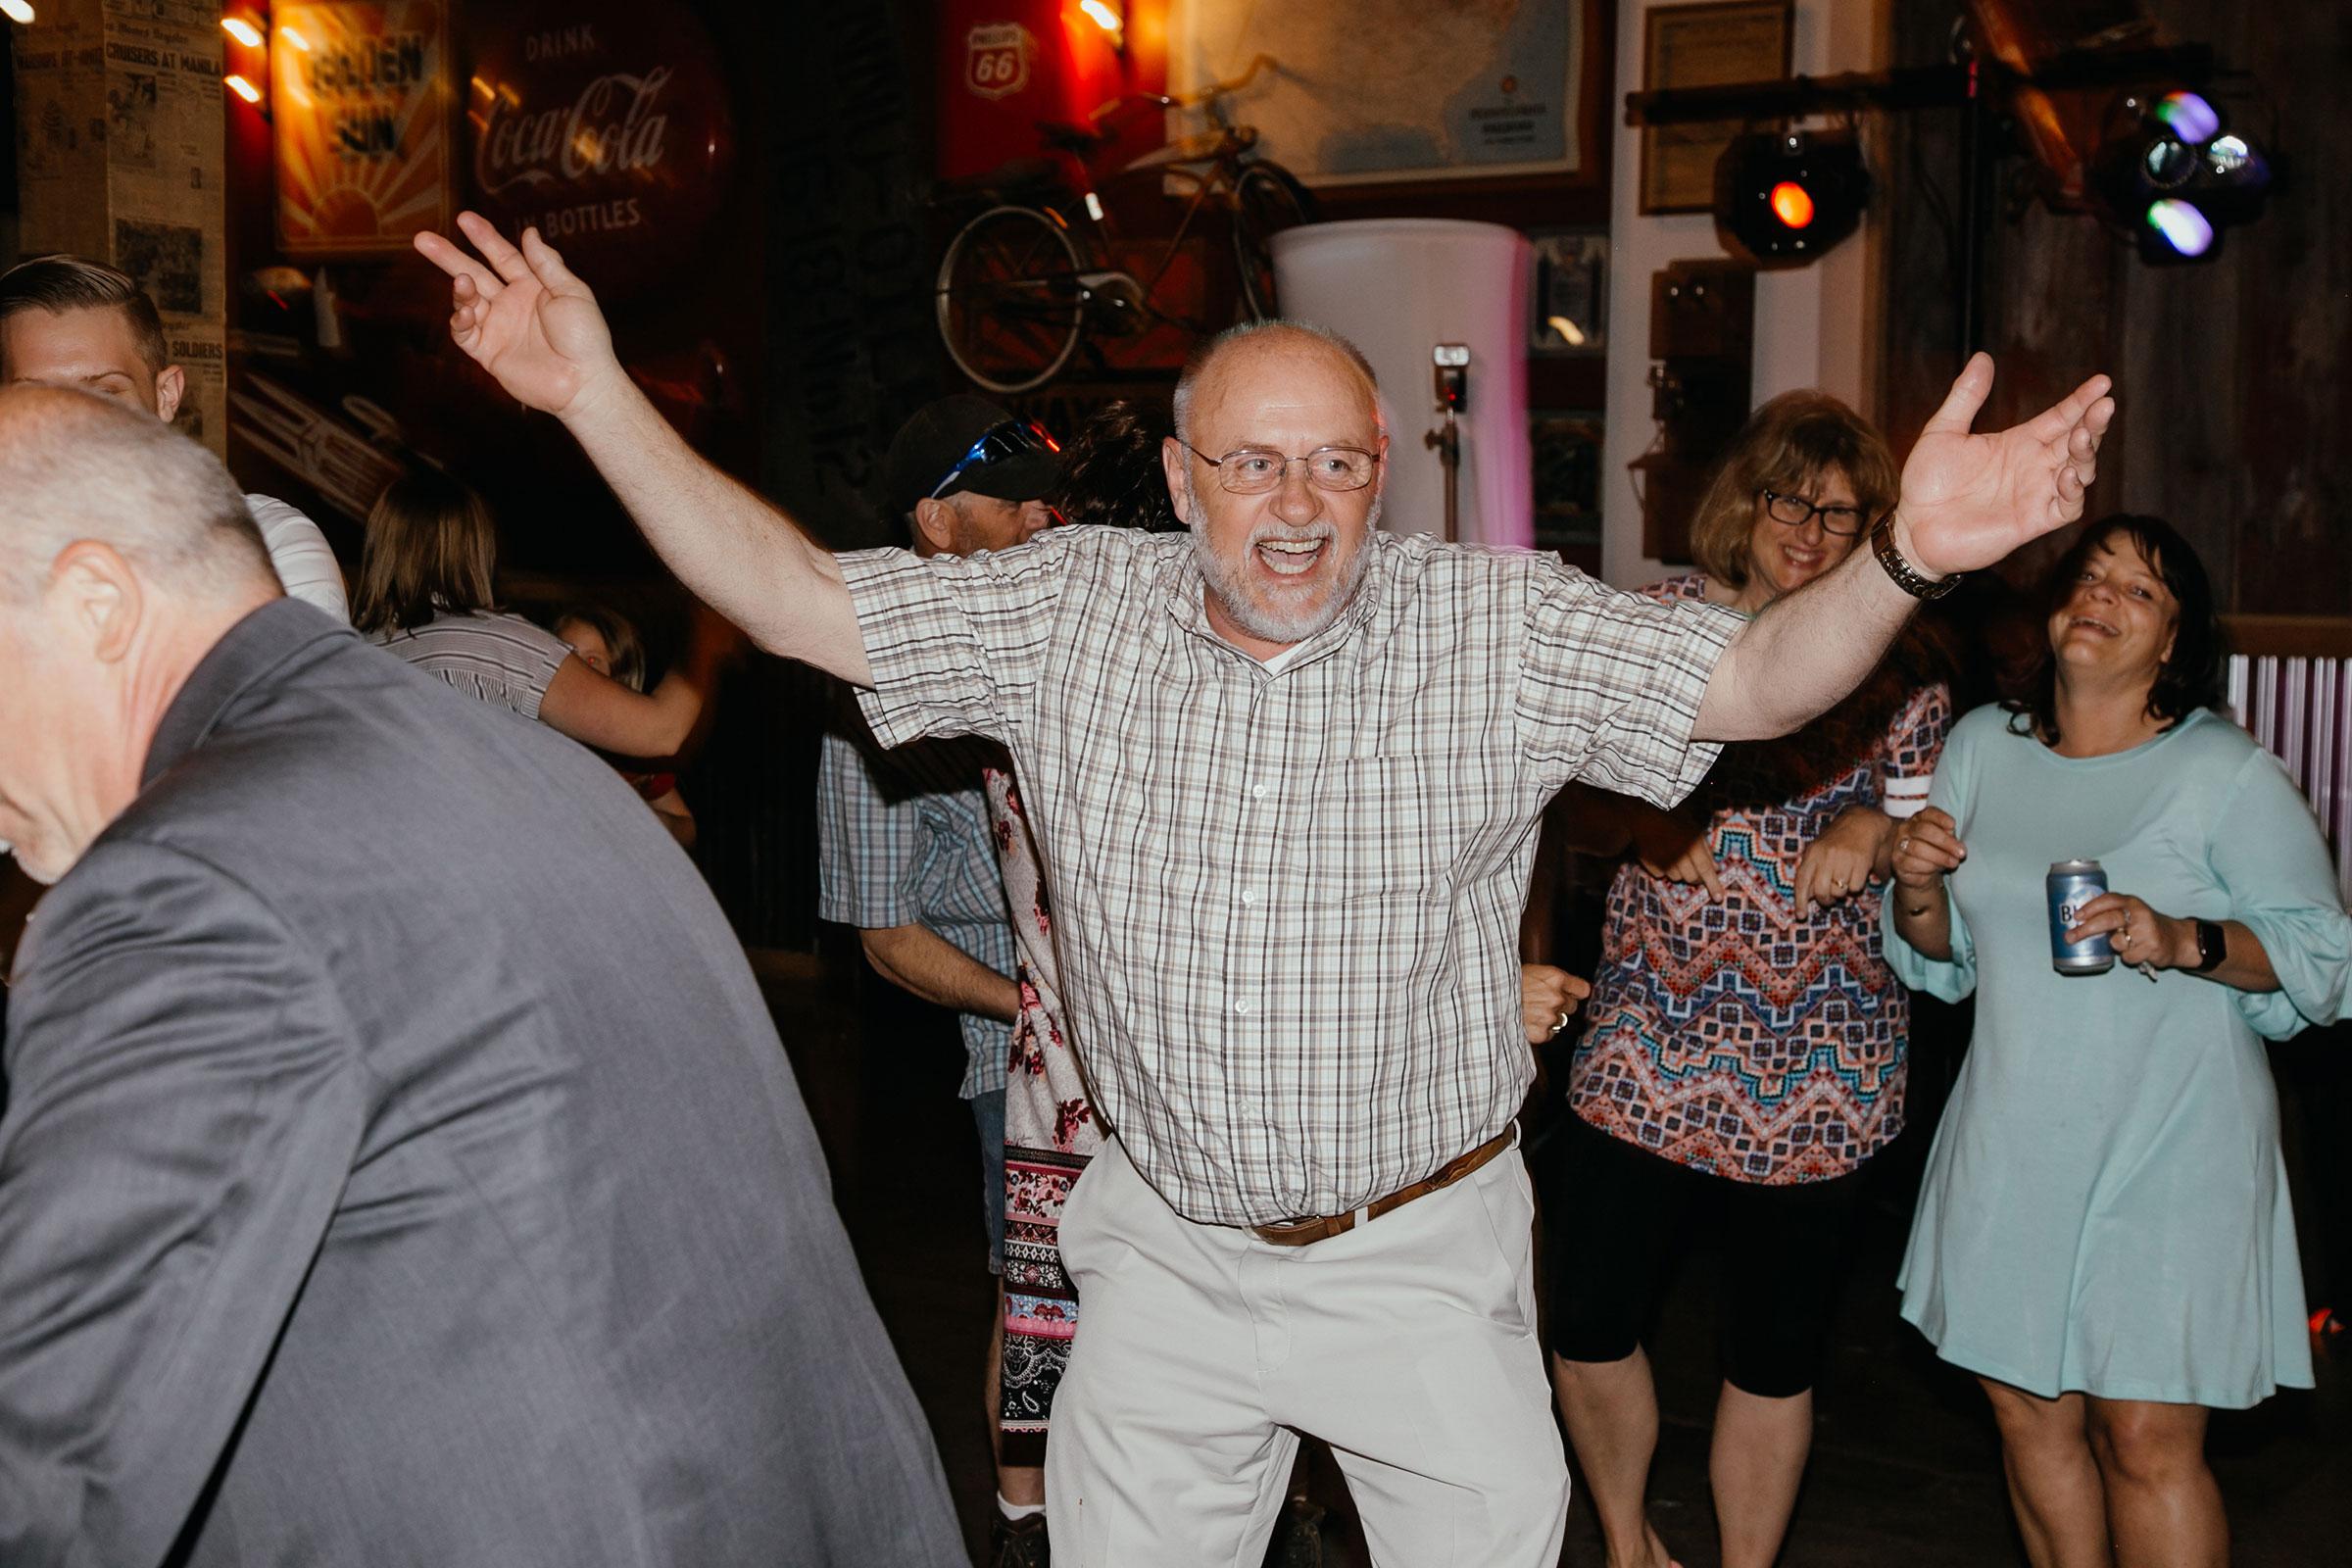 person-dancing-on-floor-decades-event-center-building-desmoines-iowa-raelyn-ramey-photography..jpg